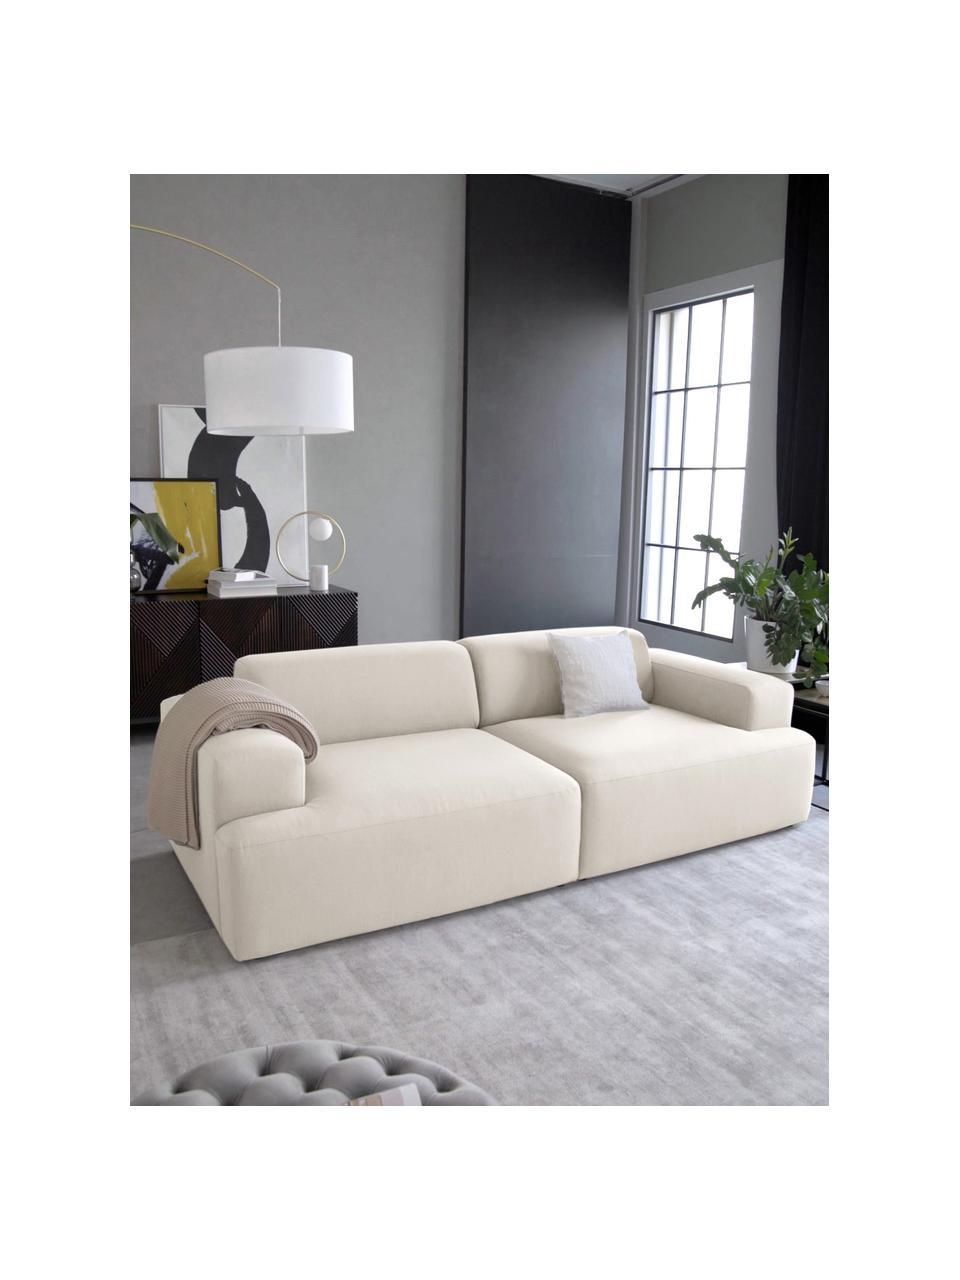 Sofa Melva (3-Sitzer) in Beige, Bezug: 100% Polyester Der hochwe, Gestell: Massives Kiefernholz, FSC, Füße: Kunststoff, Webstoff Beige, B 238 x T 101 cm